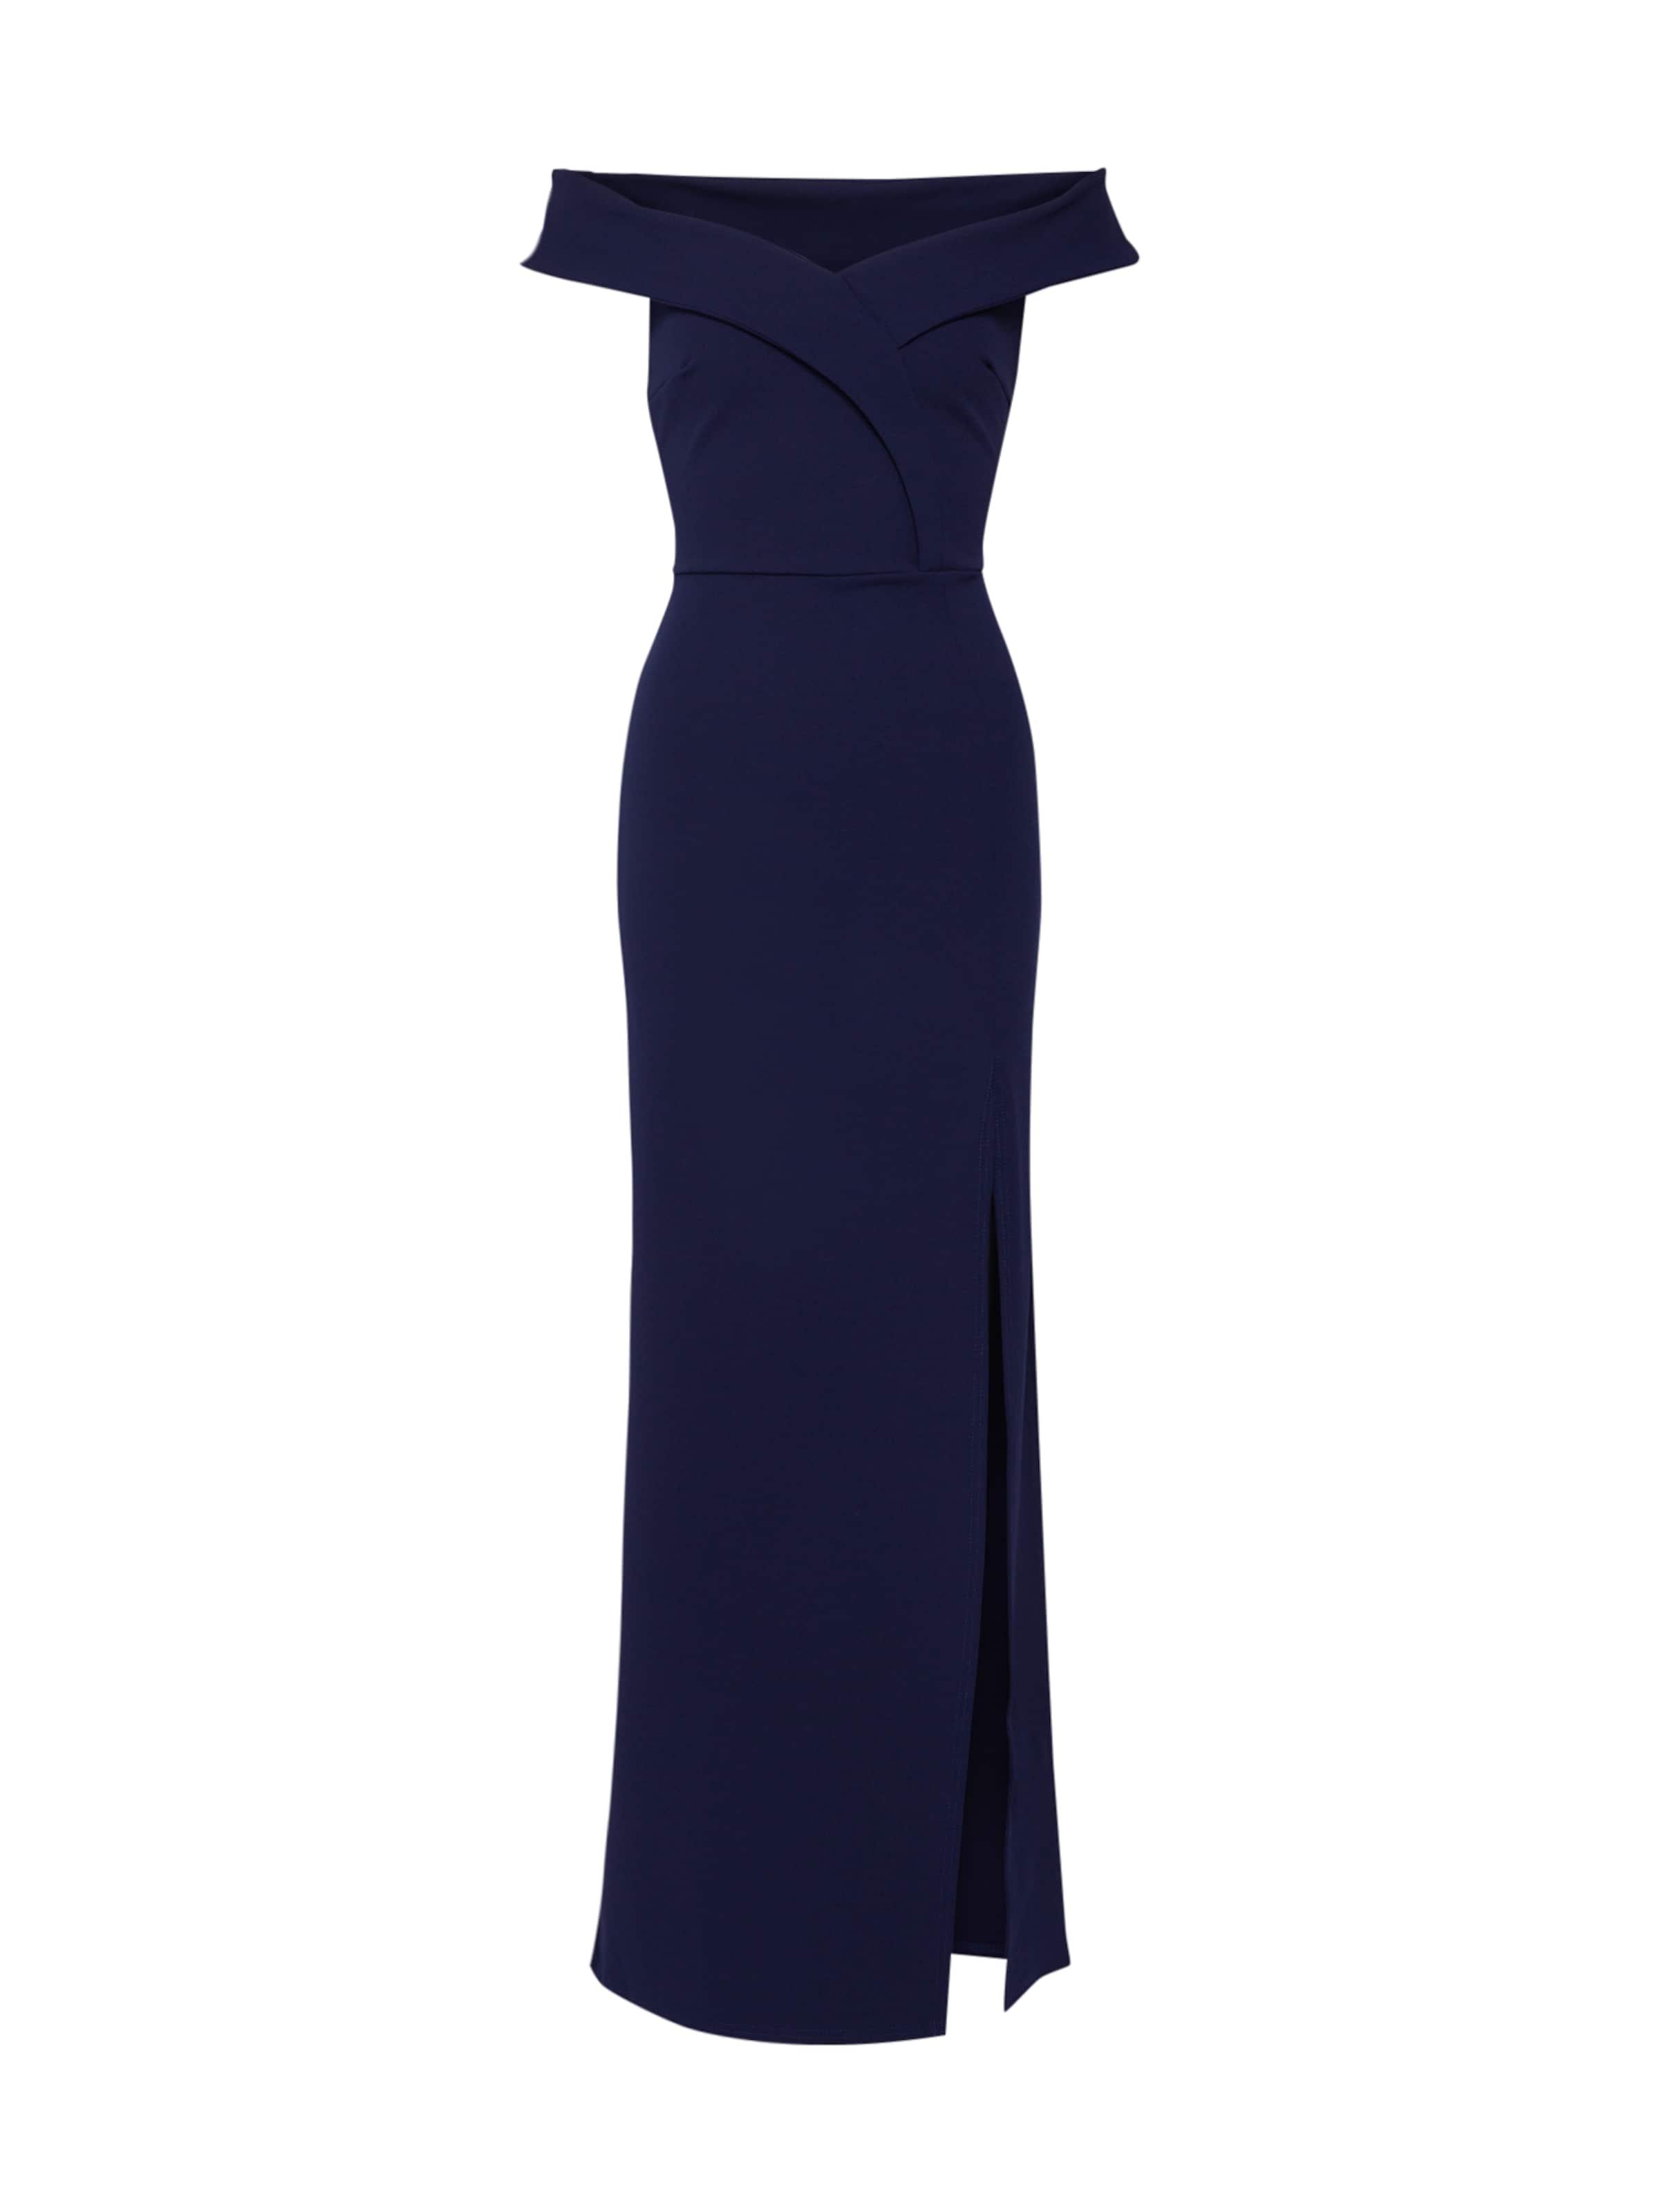 En Marine Robe Missguided De Soirée Bleu tQhrdCs